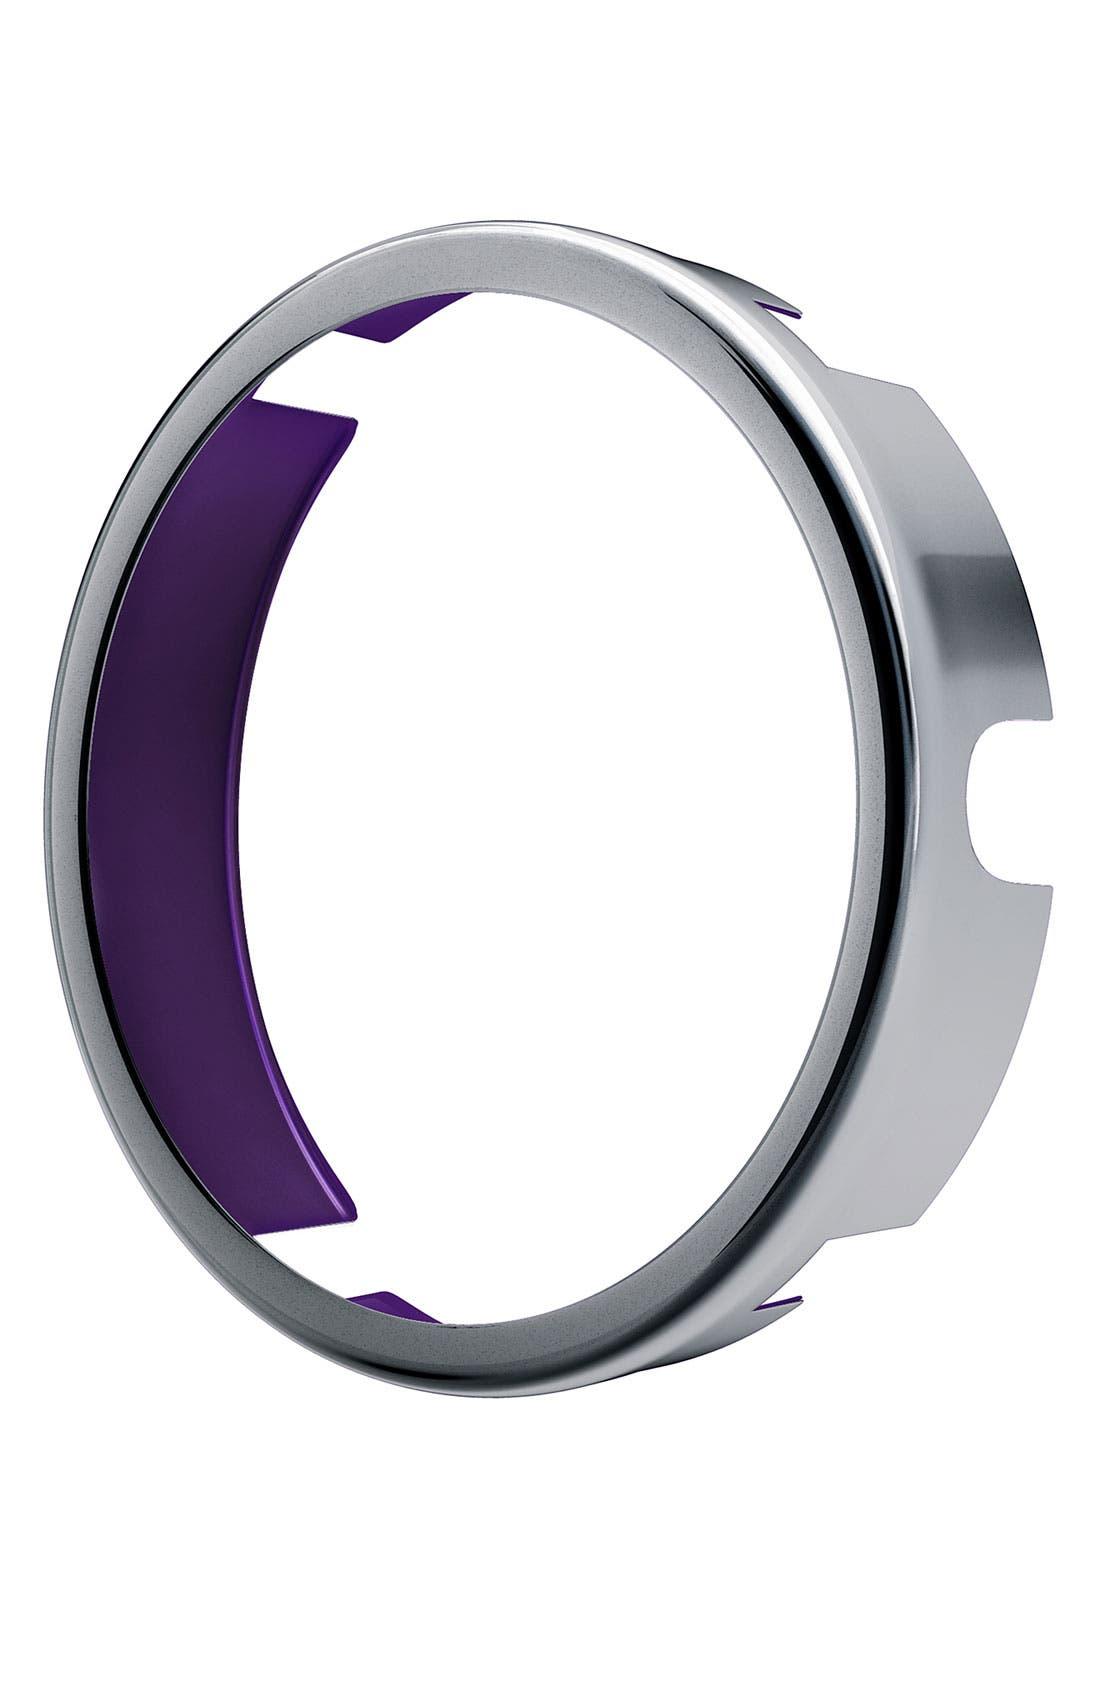 Main Image - Movado 'Bold' Metallic Watch Case Cover